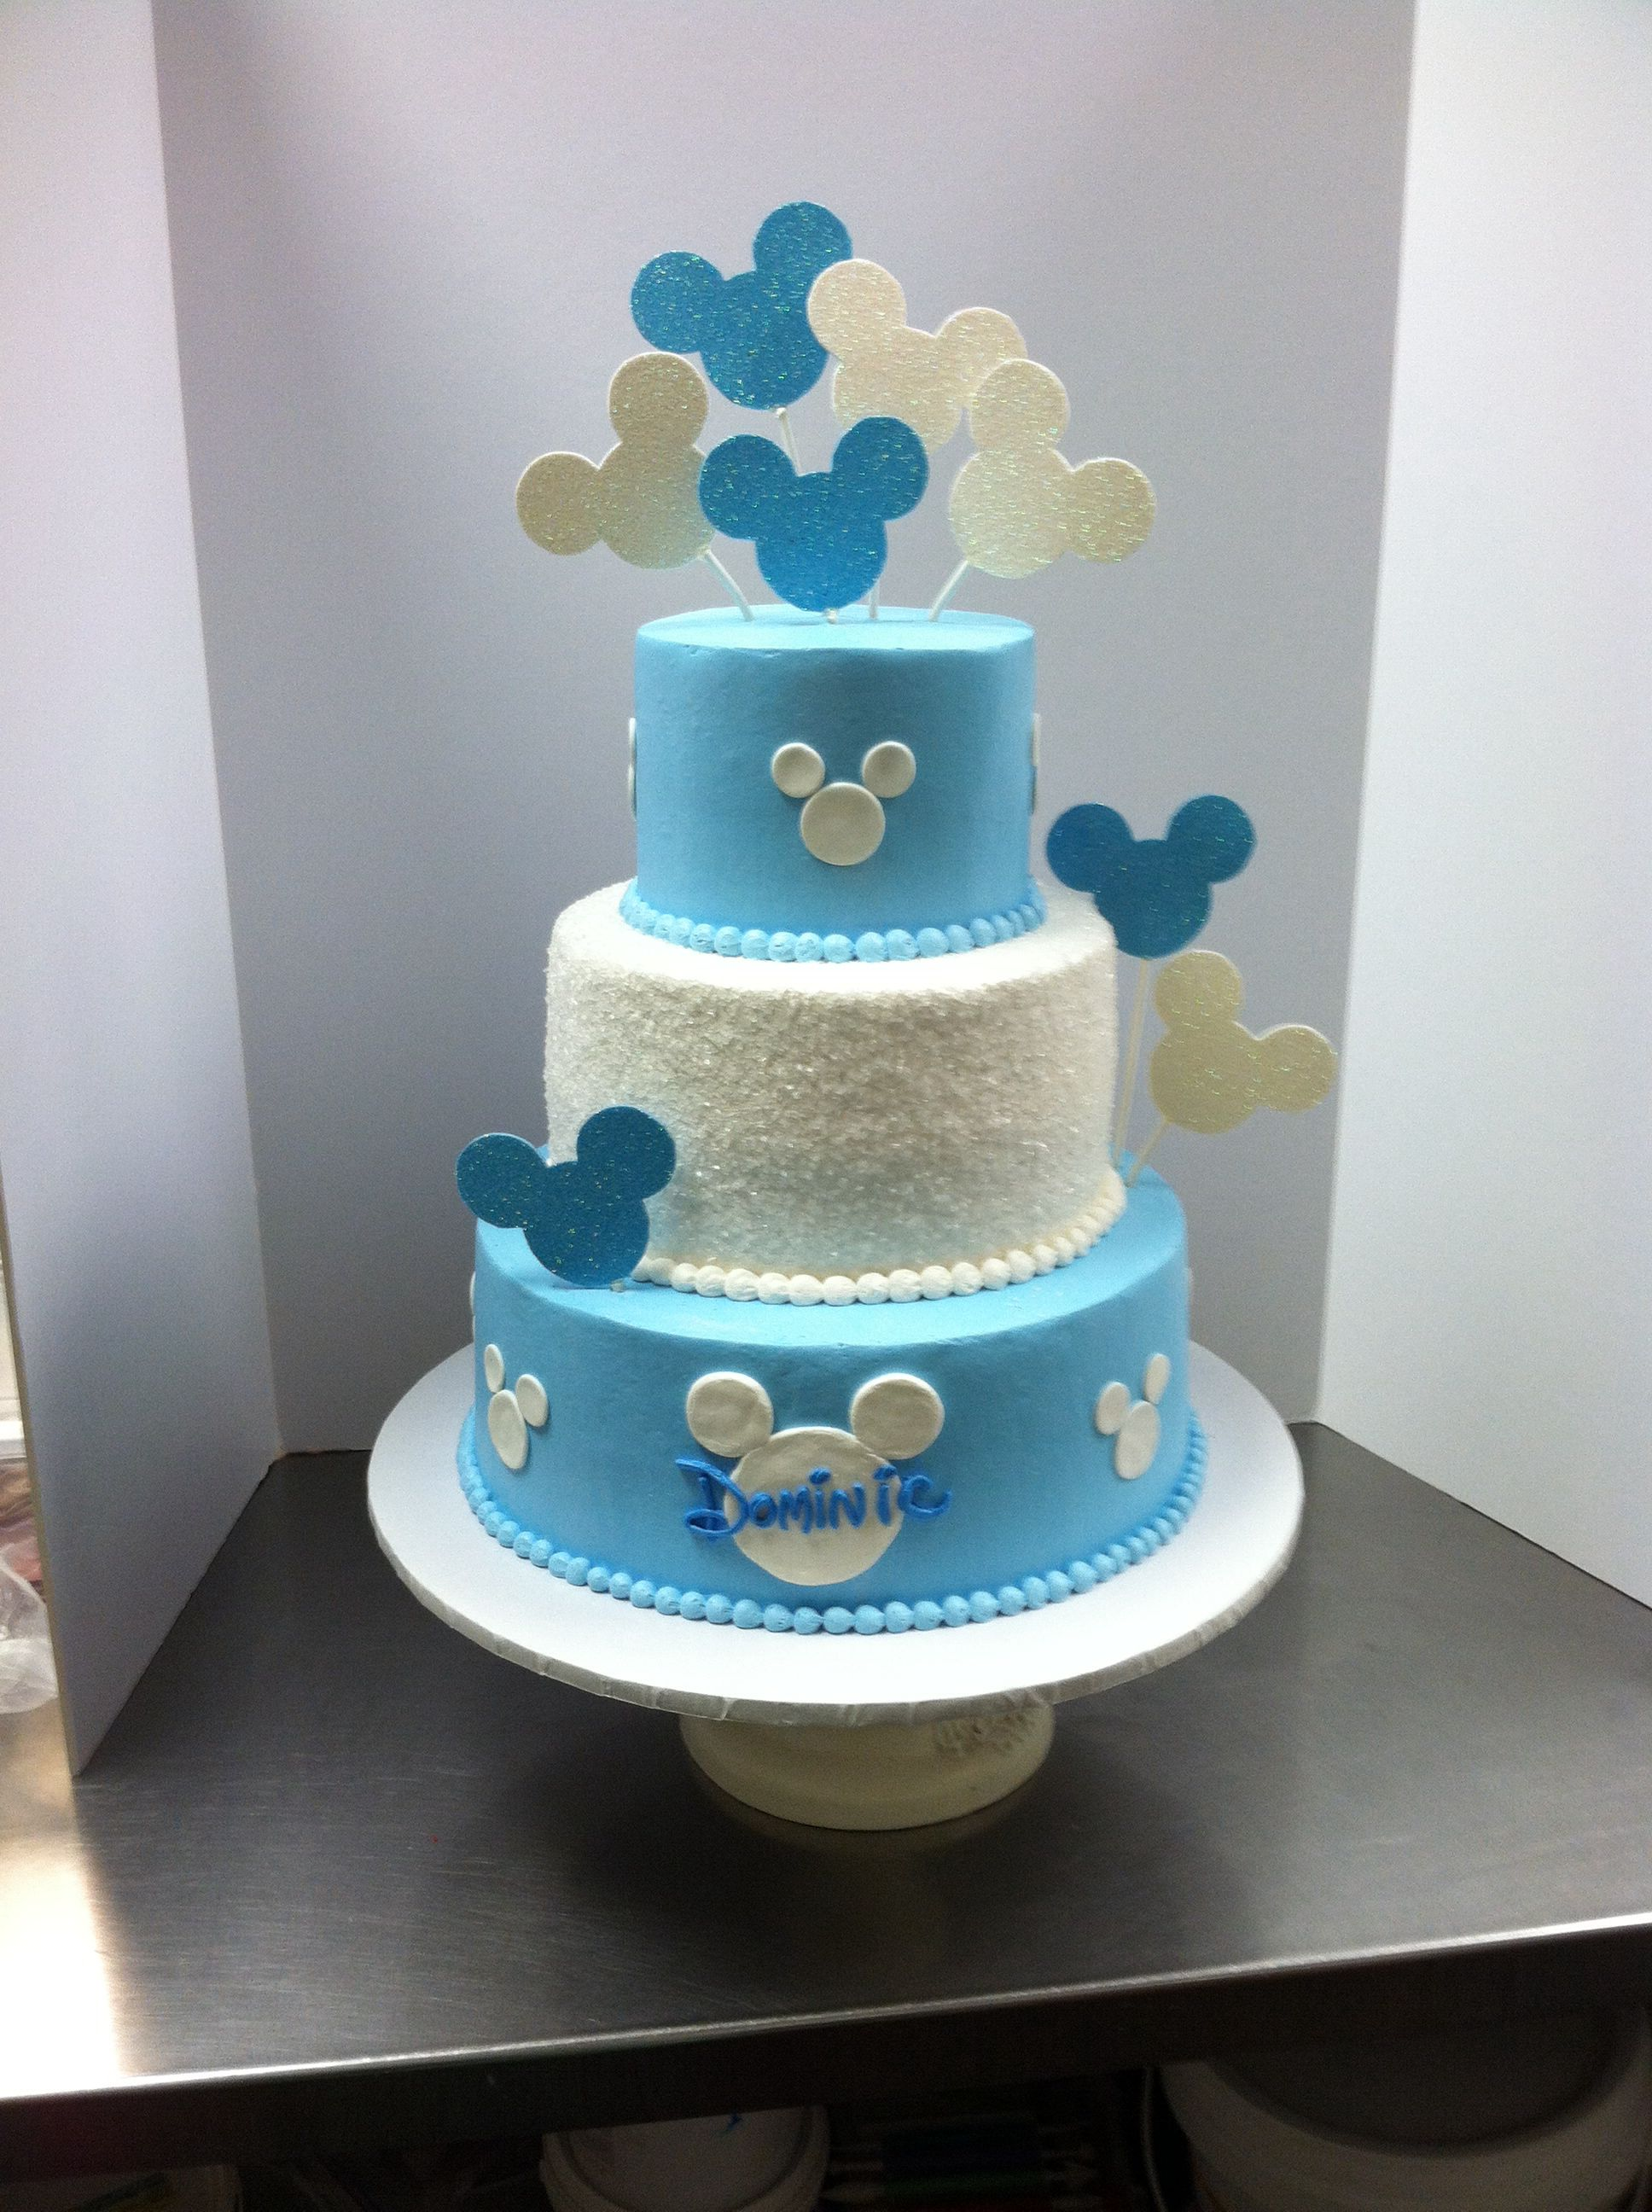 Sensational Baby Mickey Birthday Cake Luckytreats Mickey Mickey Birthday Funny Birthday Cards Online Alyptdamsfinfo